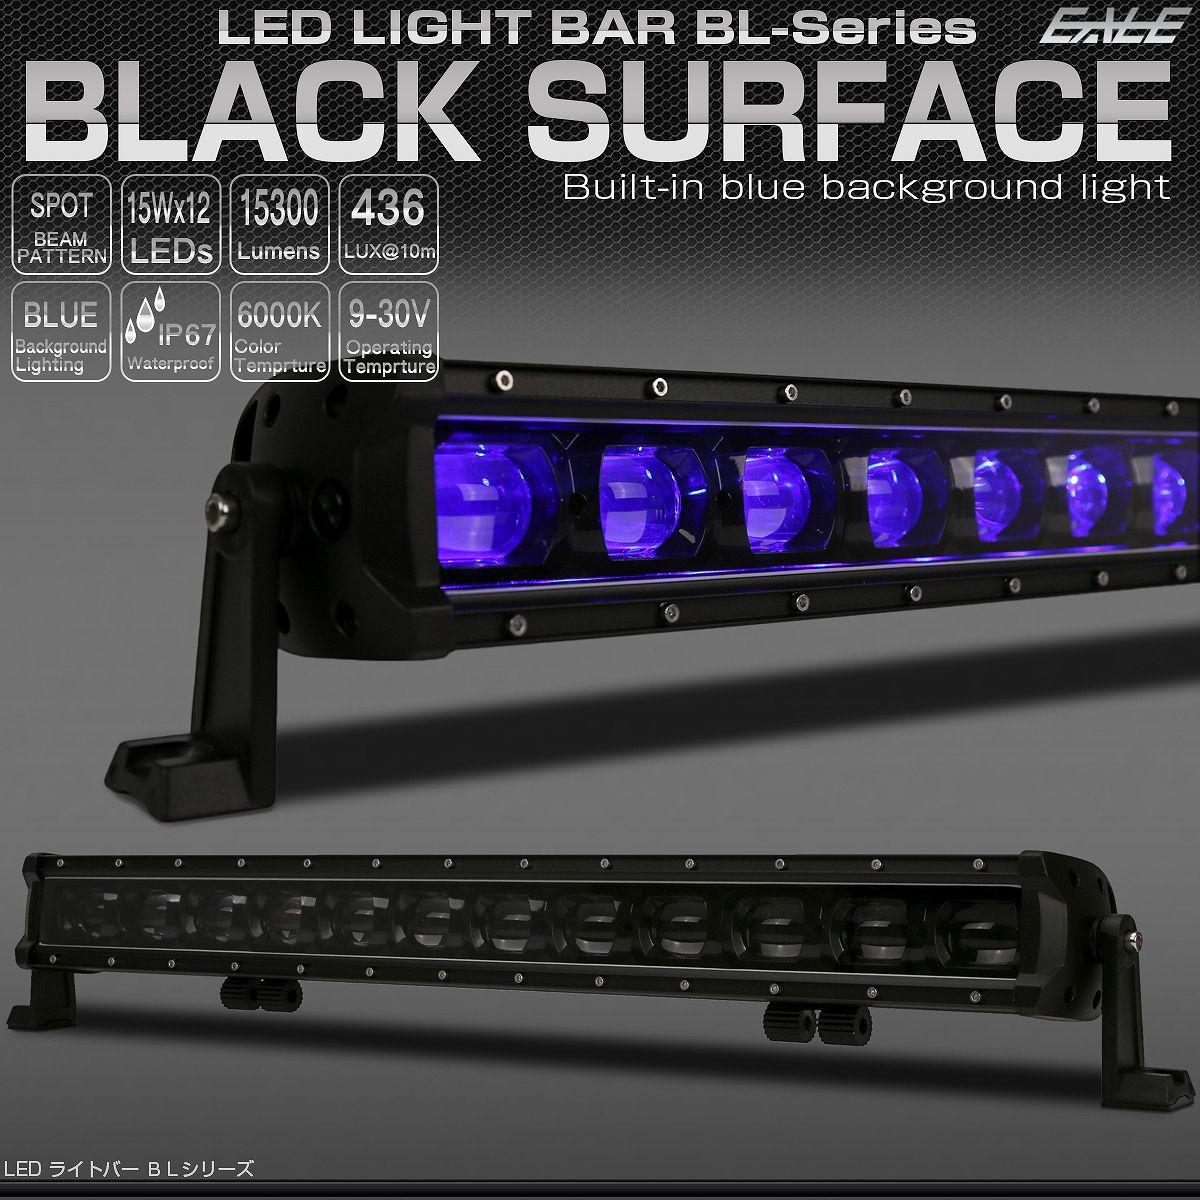 LEDライトバー 作業灯 180W 28インチ ブルー バックライト内蔵 ブラックインナー スポット 15300ルーメン 12V 24V P-544